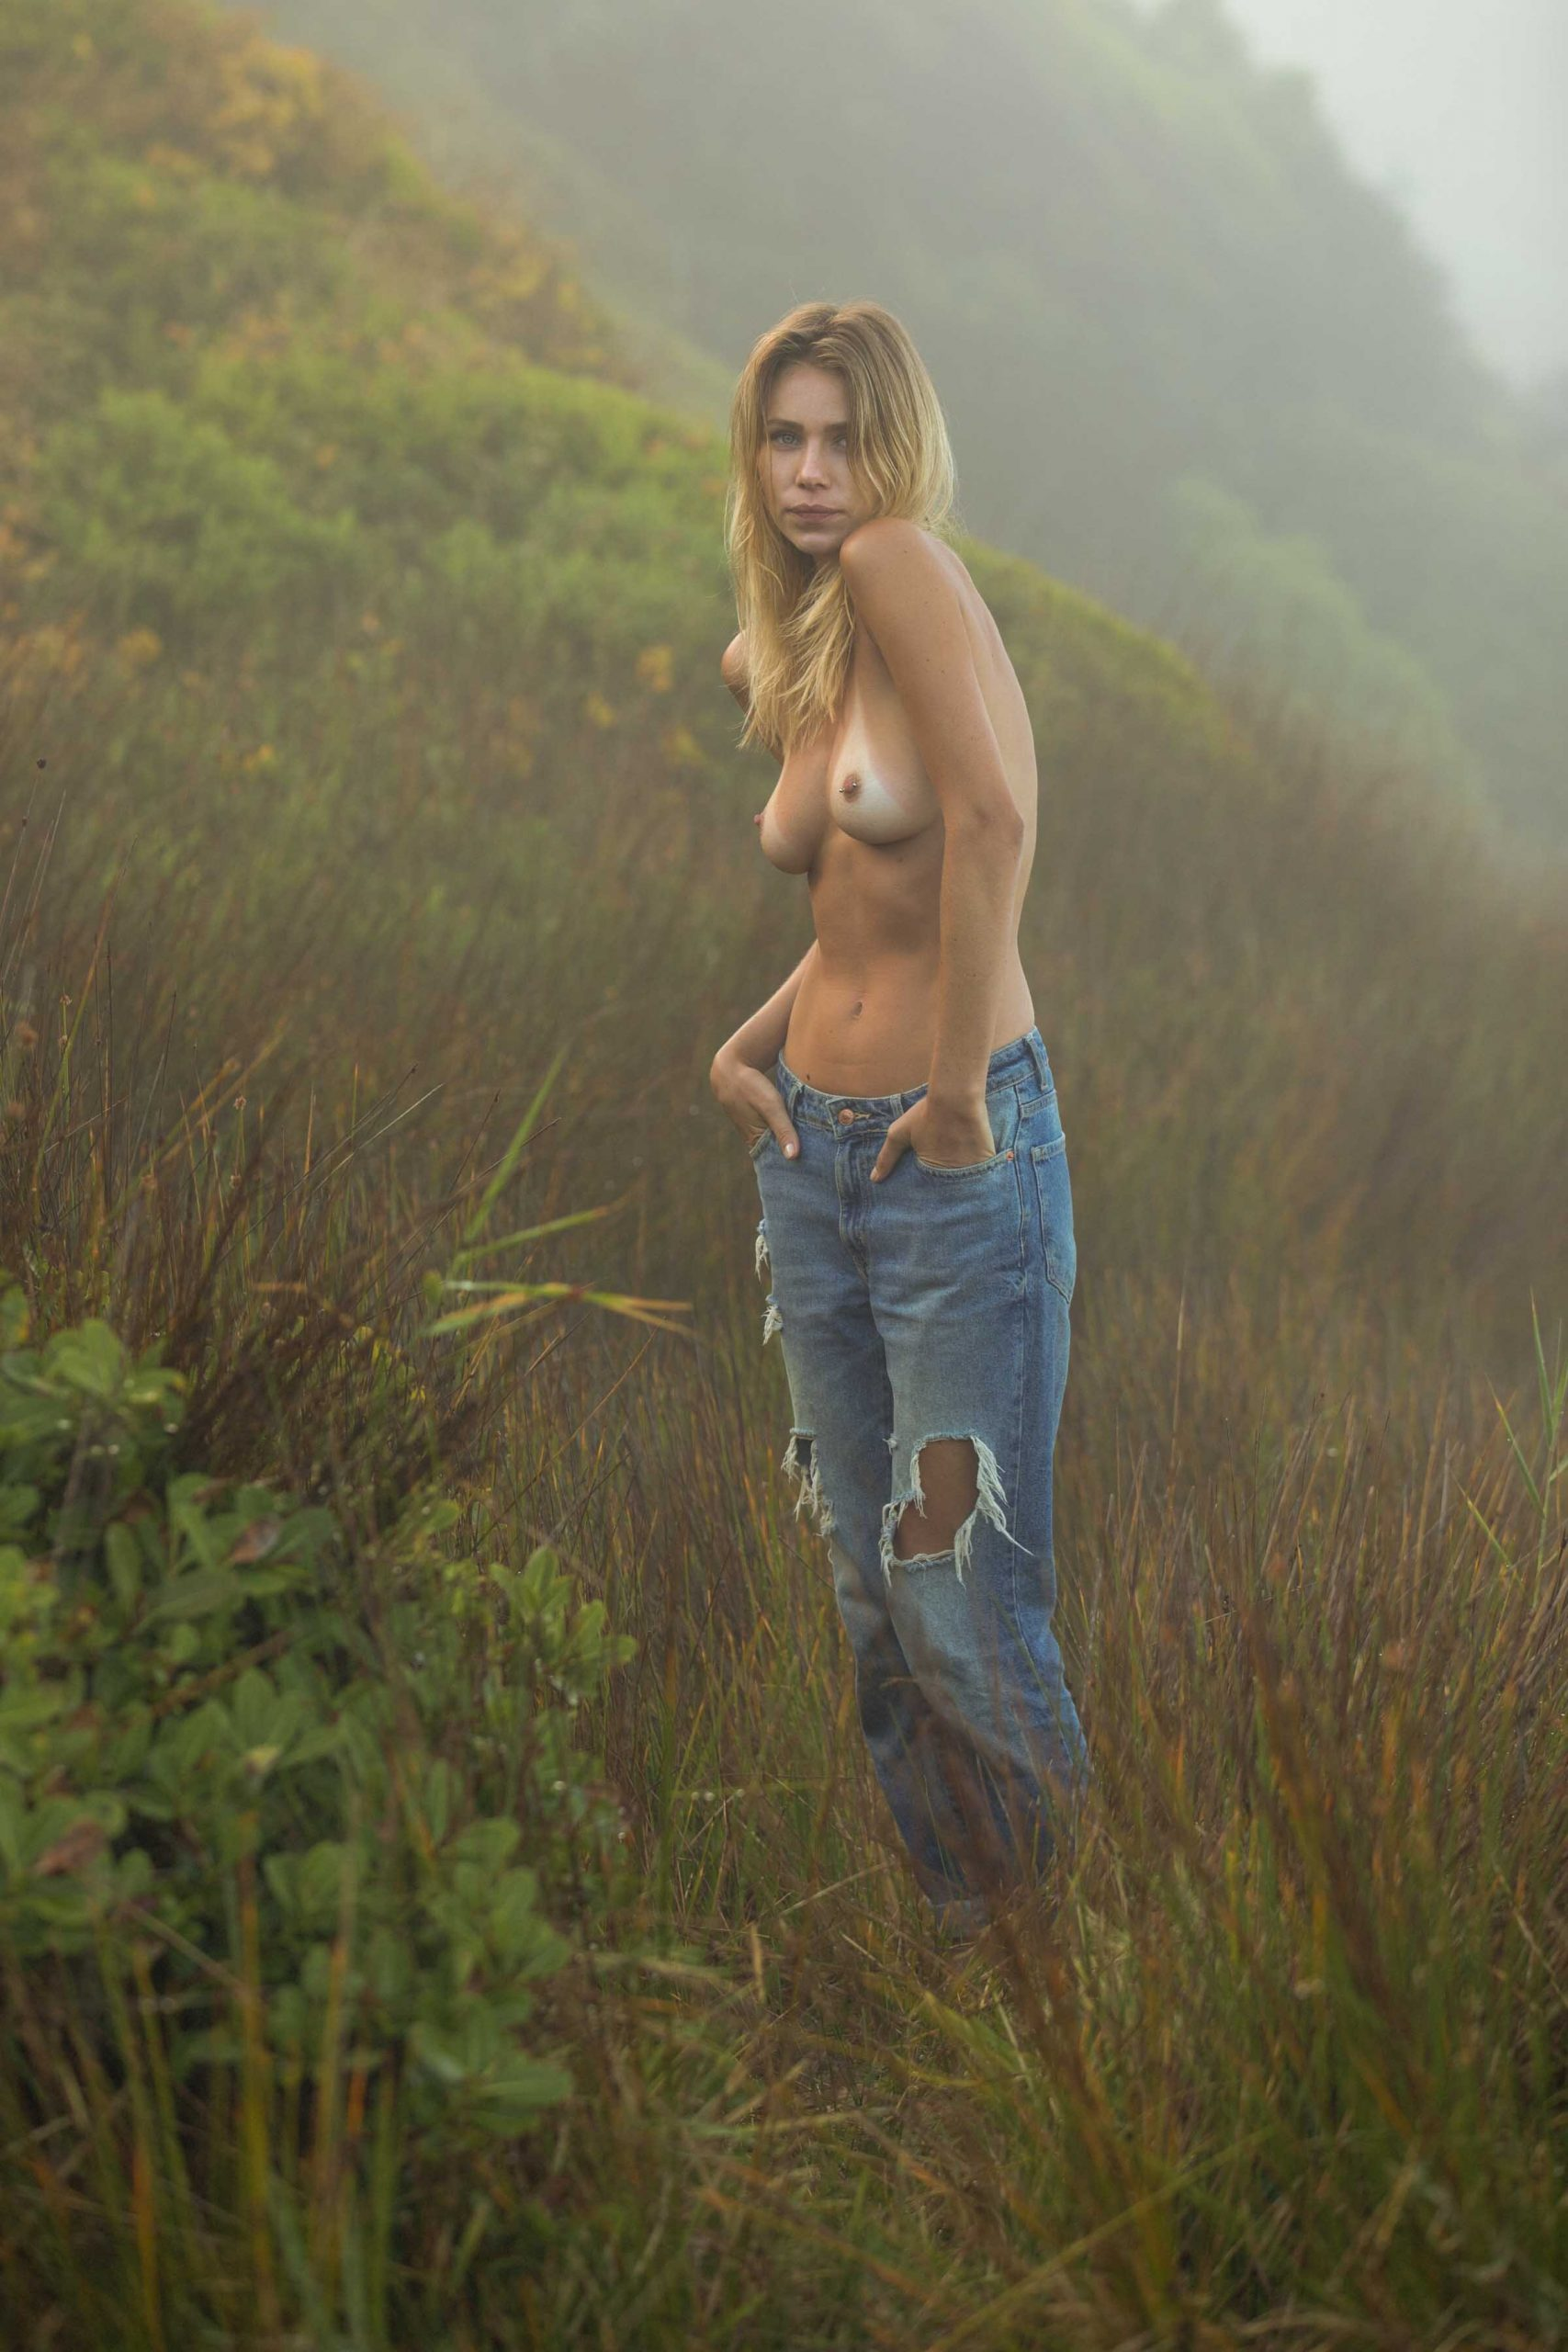 Gracie Hans - Gary Huddlestone photoshoot